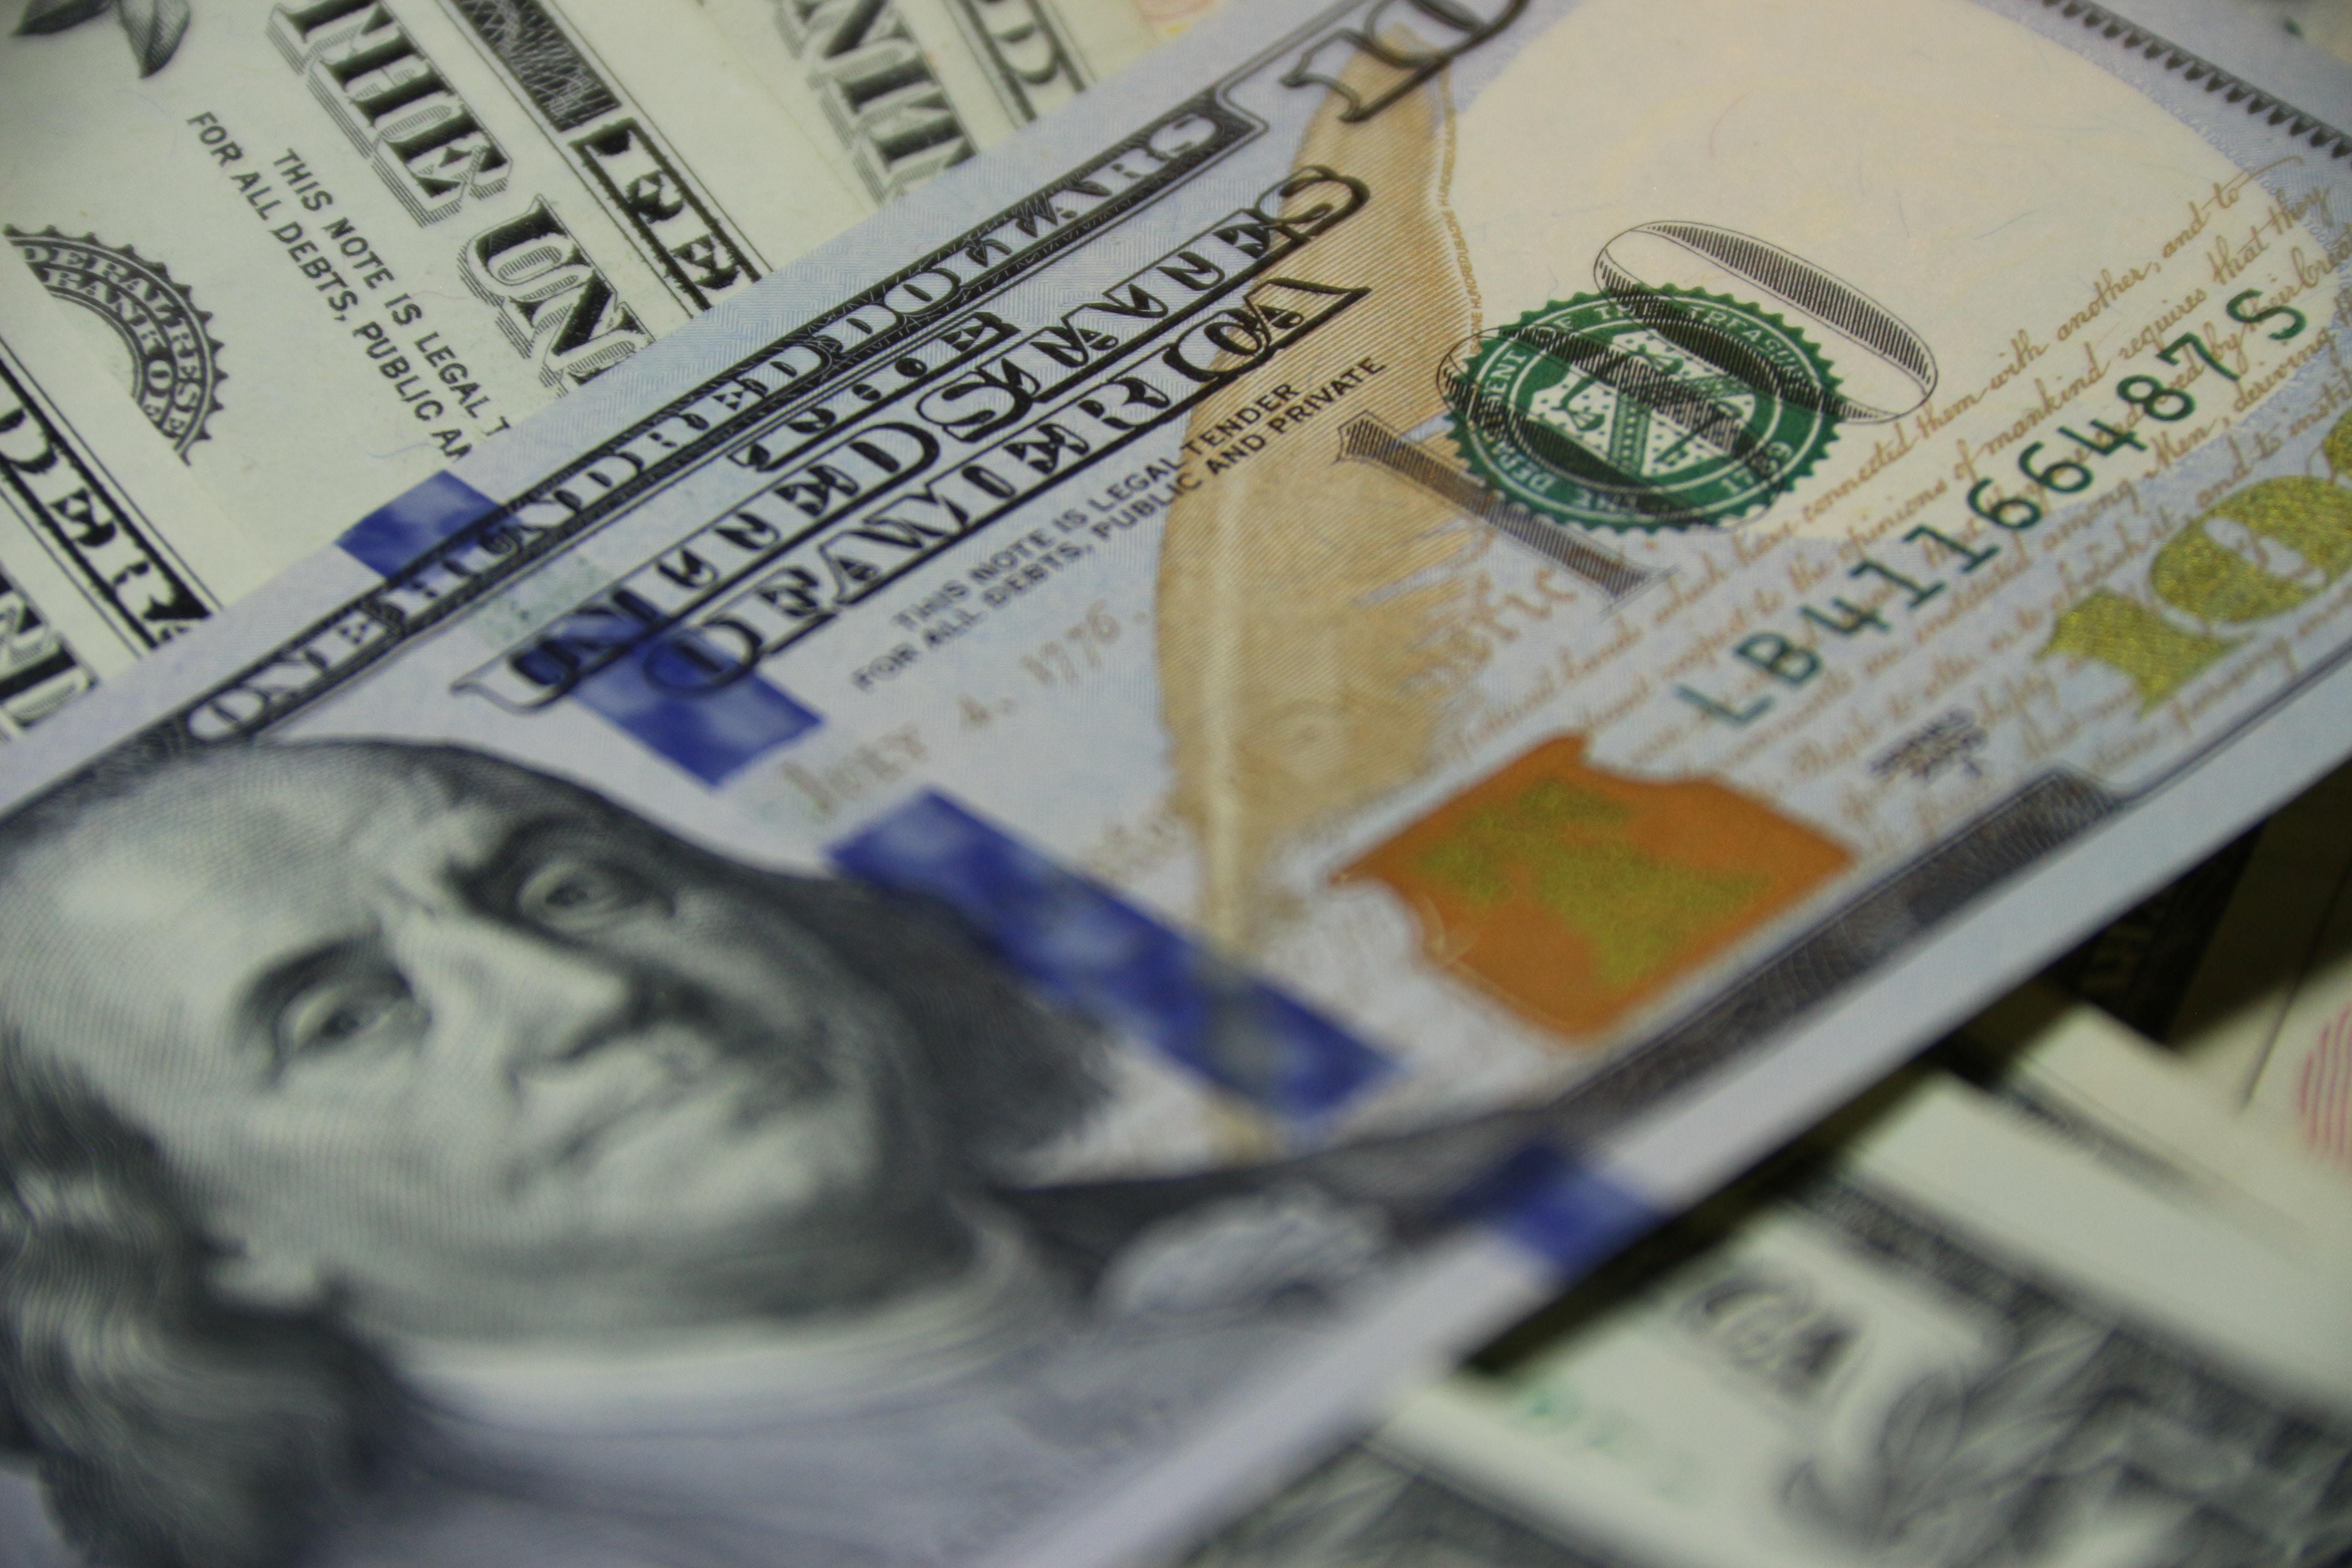 Fundrise kaasas 31 miljonit dollarit uut kapitali